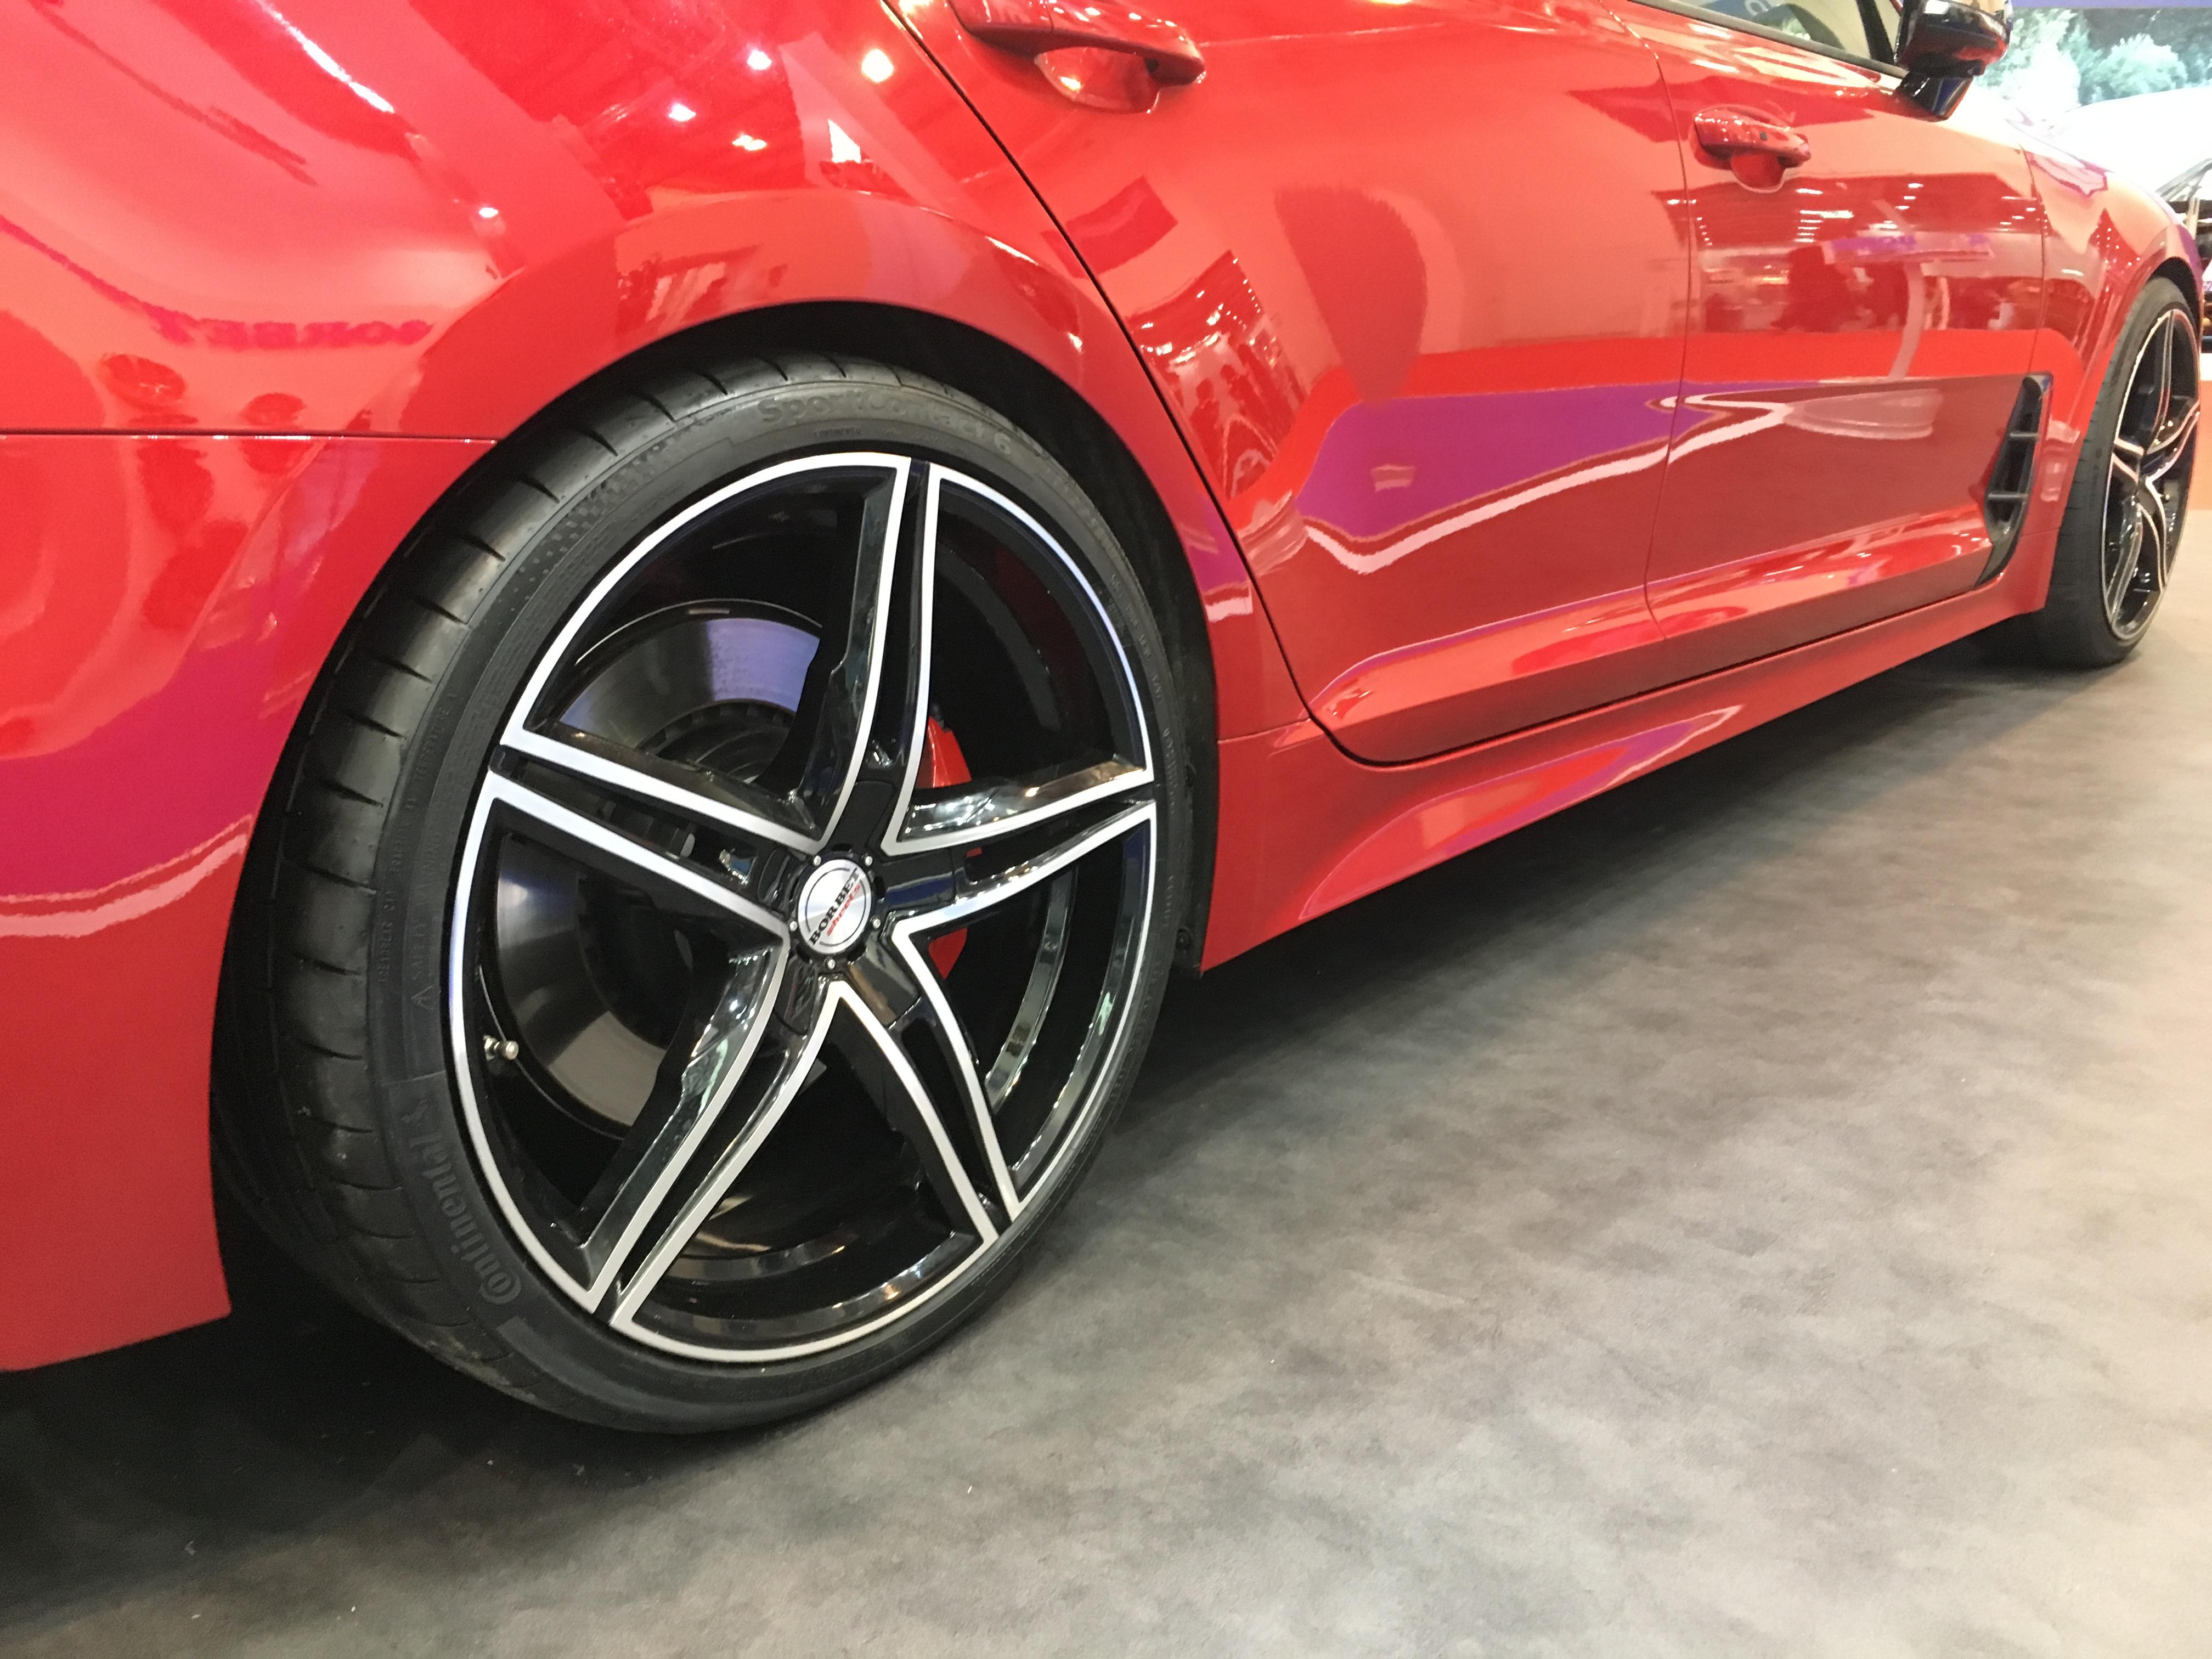 Felge Borbet XR RAd black matt polished auf der Essen Motor show